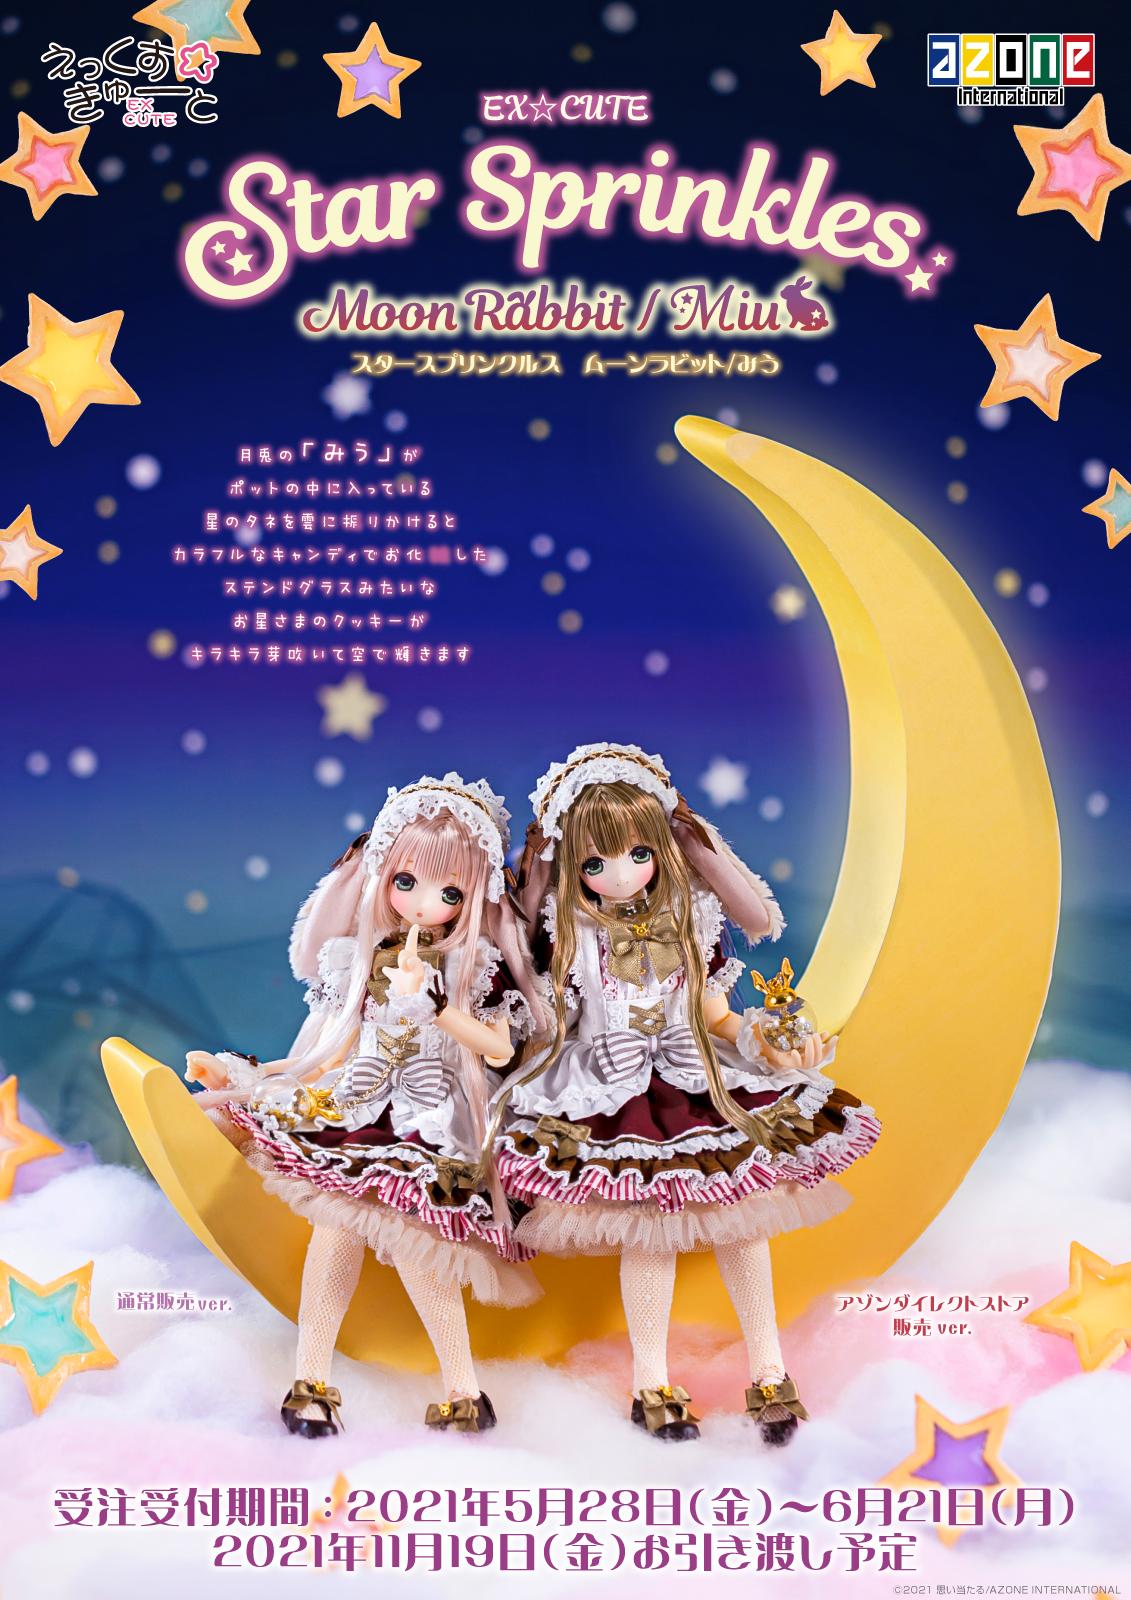 Star Sprinkles『Moon Rabbit Miu/ムーンラビット 月兎 みう』えっくす☆きゅーと 1/6 完成品ドール-001